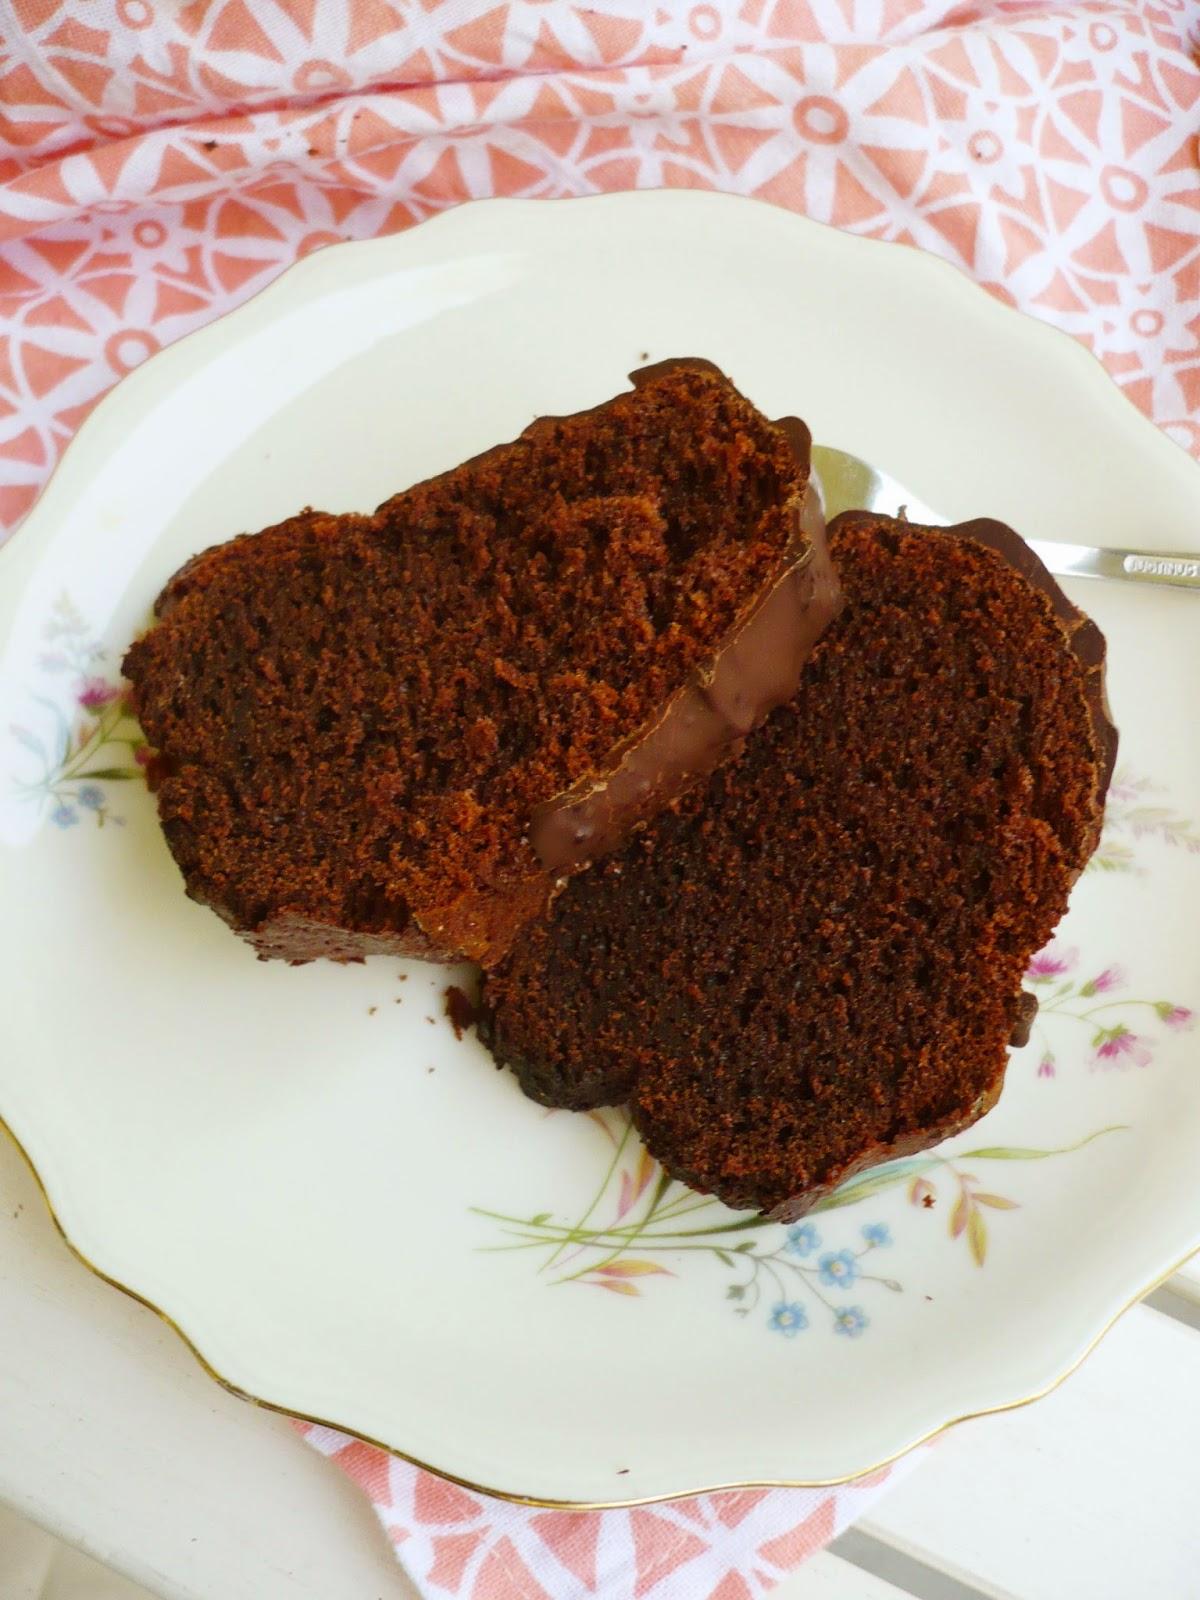 Küchenplausch | Bloggerrezept | Kakaokuchen